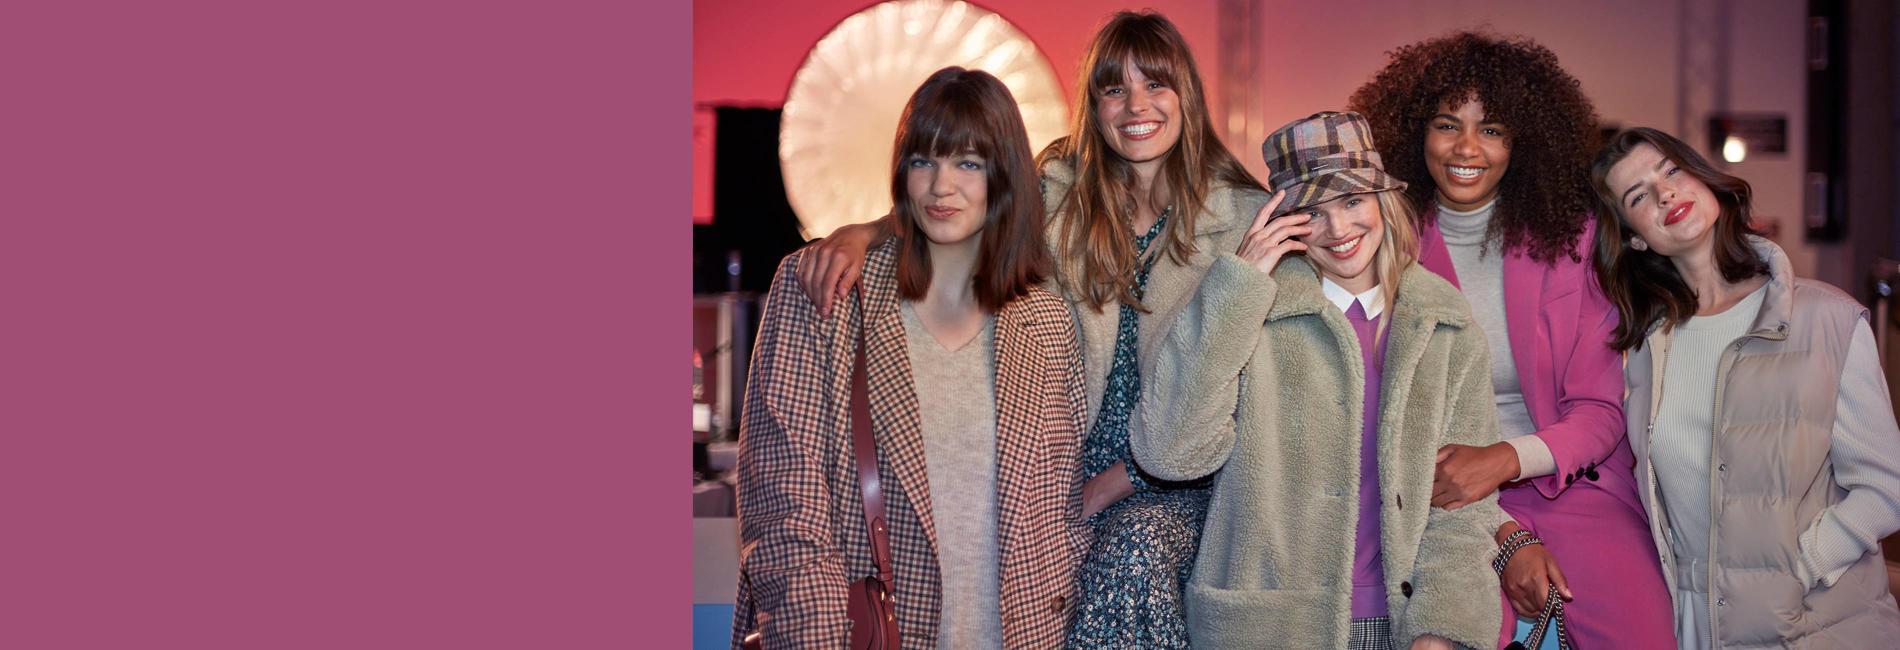 Fashion Days WK37 - HP top teaser